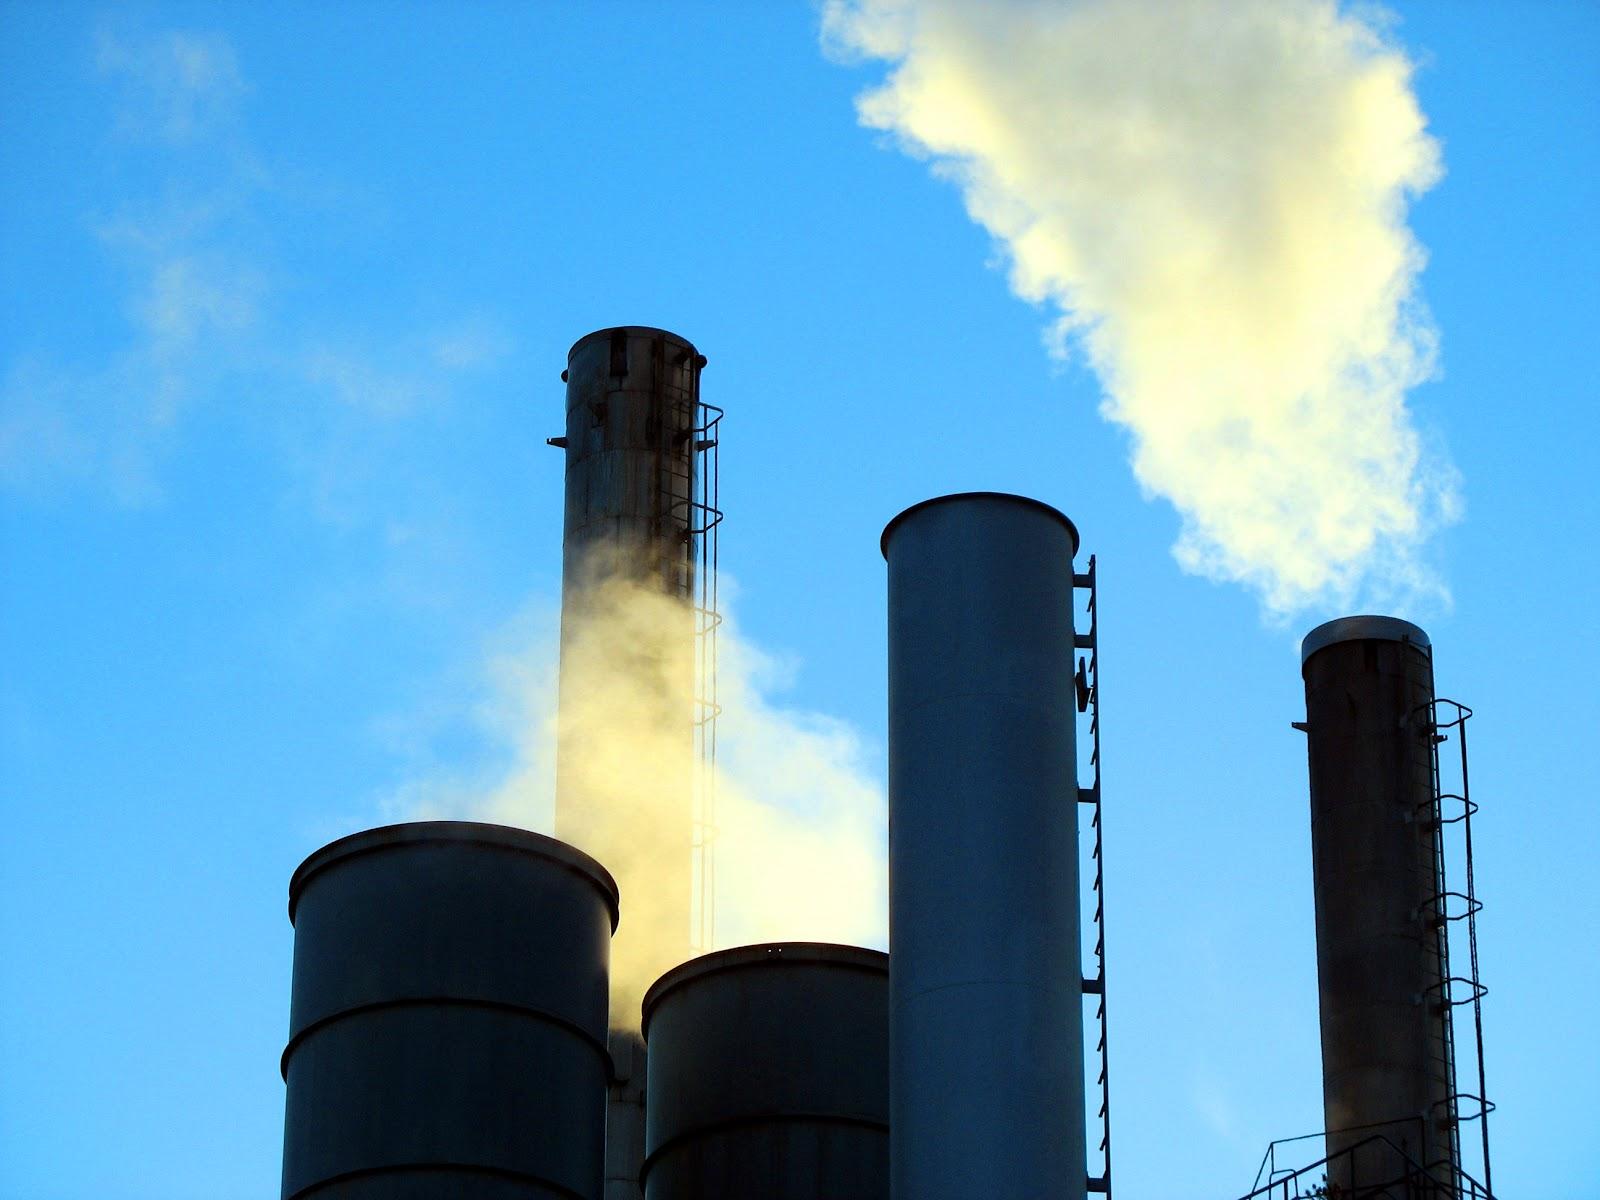 https://upload.wikimedia.org/wikipedia/commons/0/04/Industry_smoke.jpg